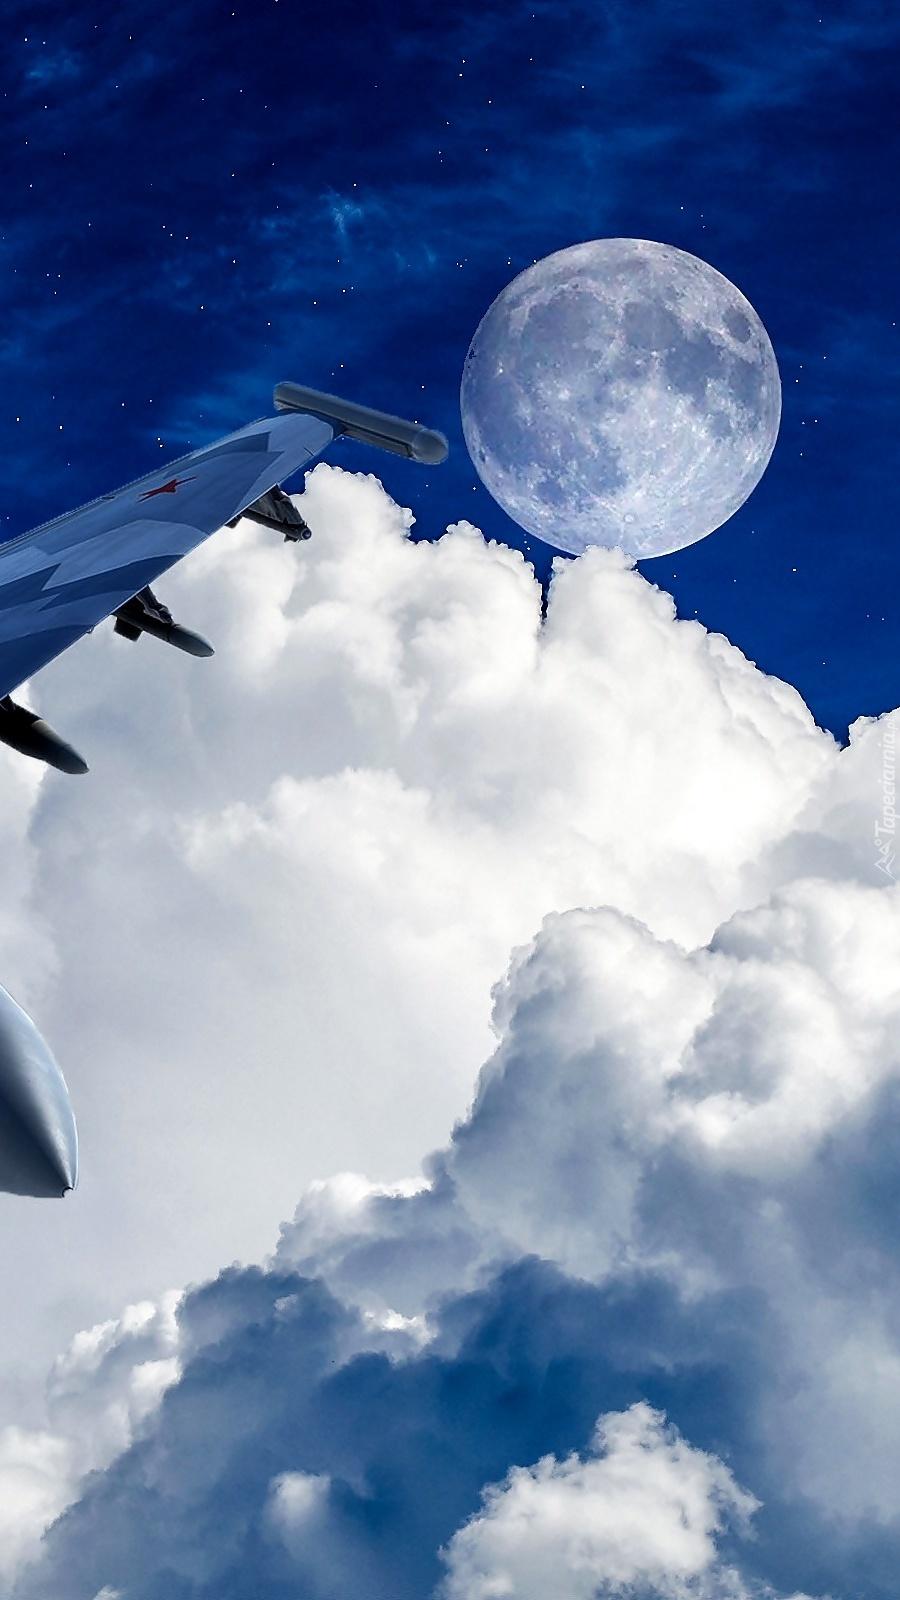 Księżyc nad chmurami